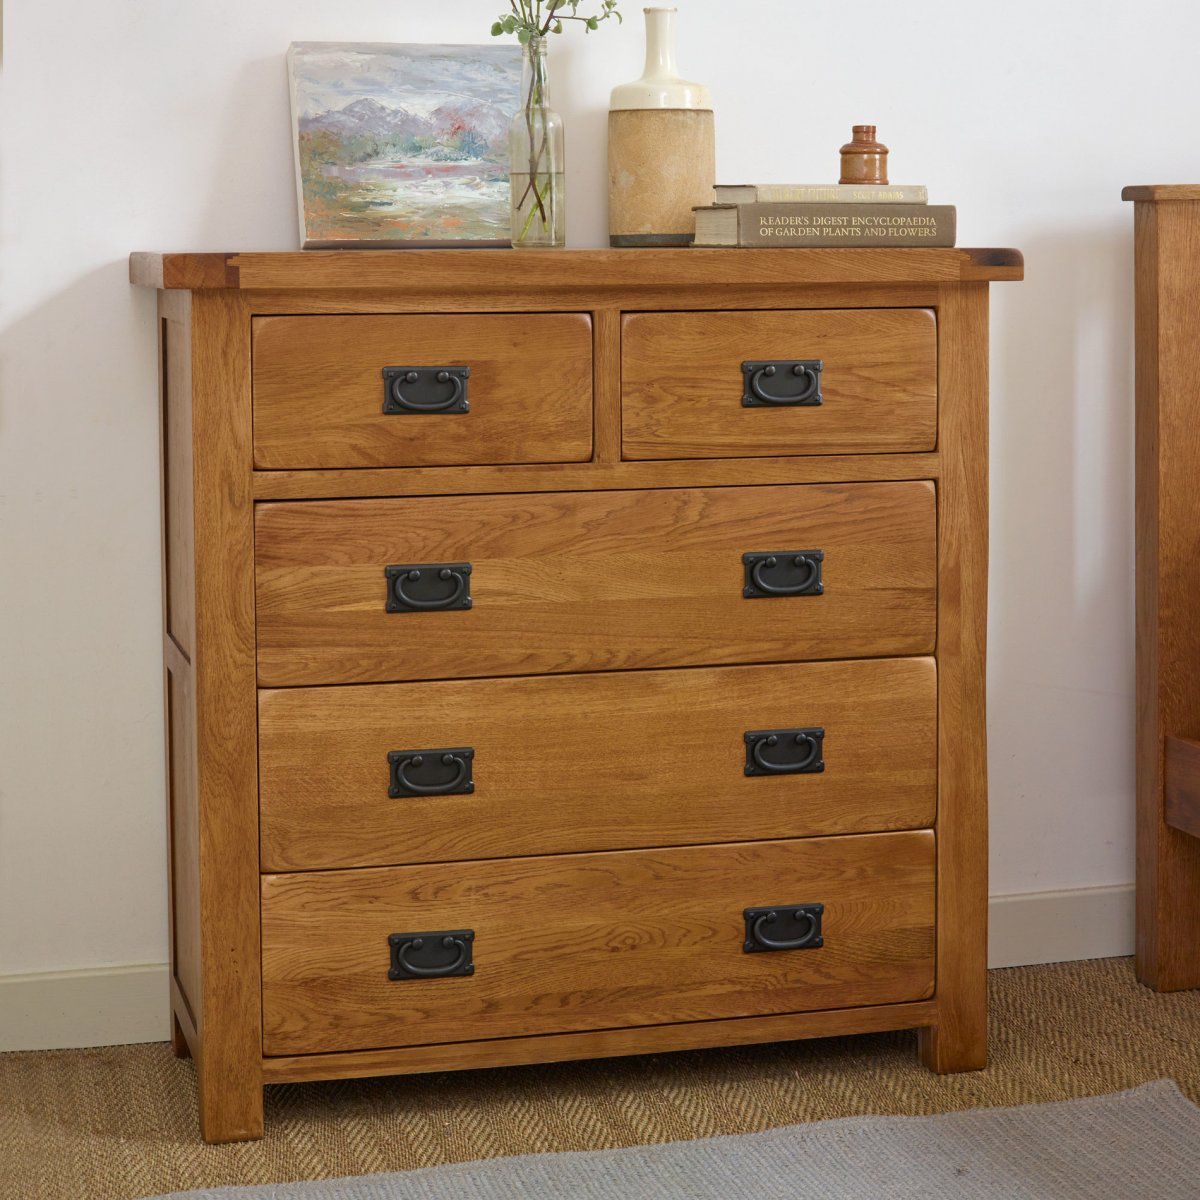 Original rustic chest of drawers in oak